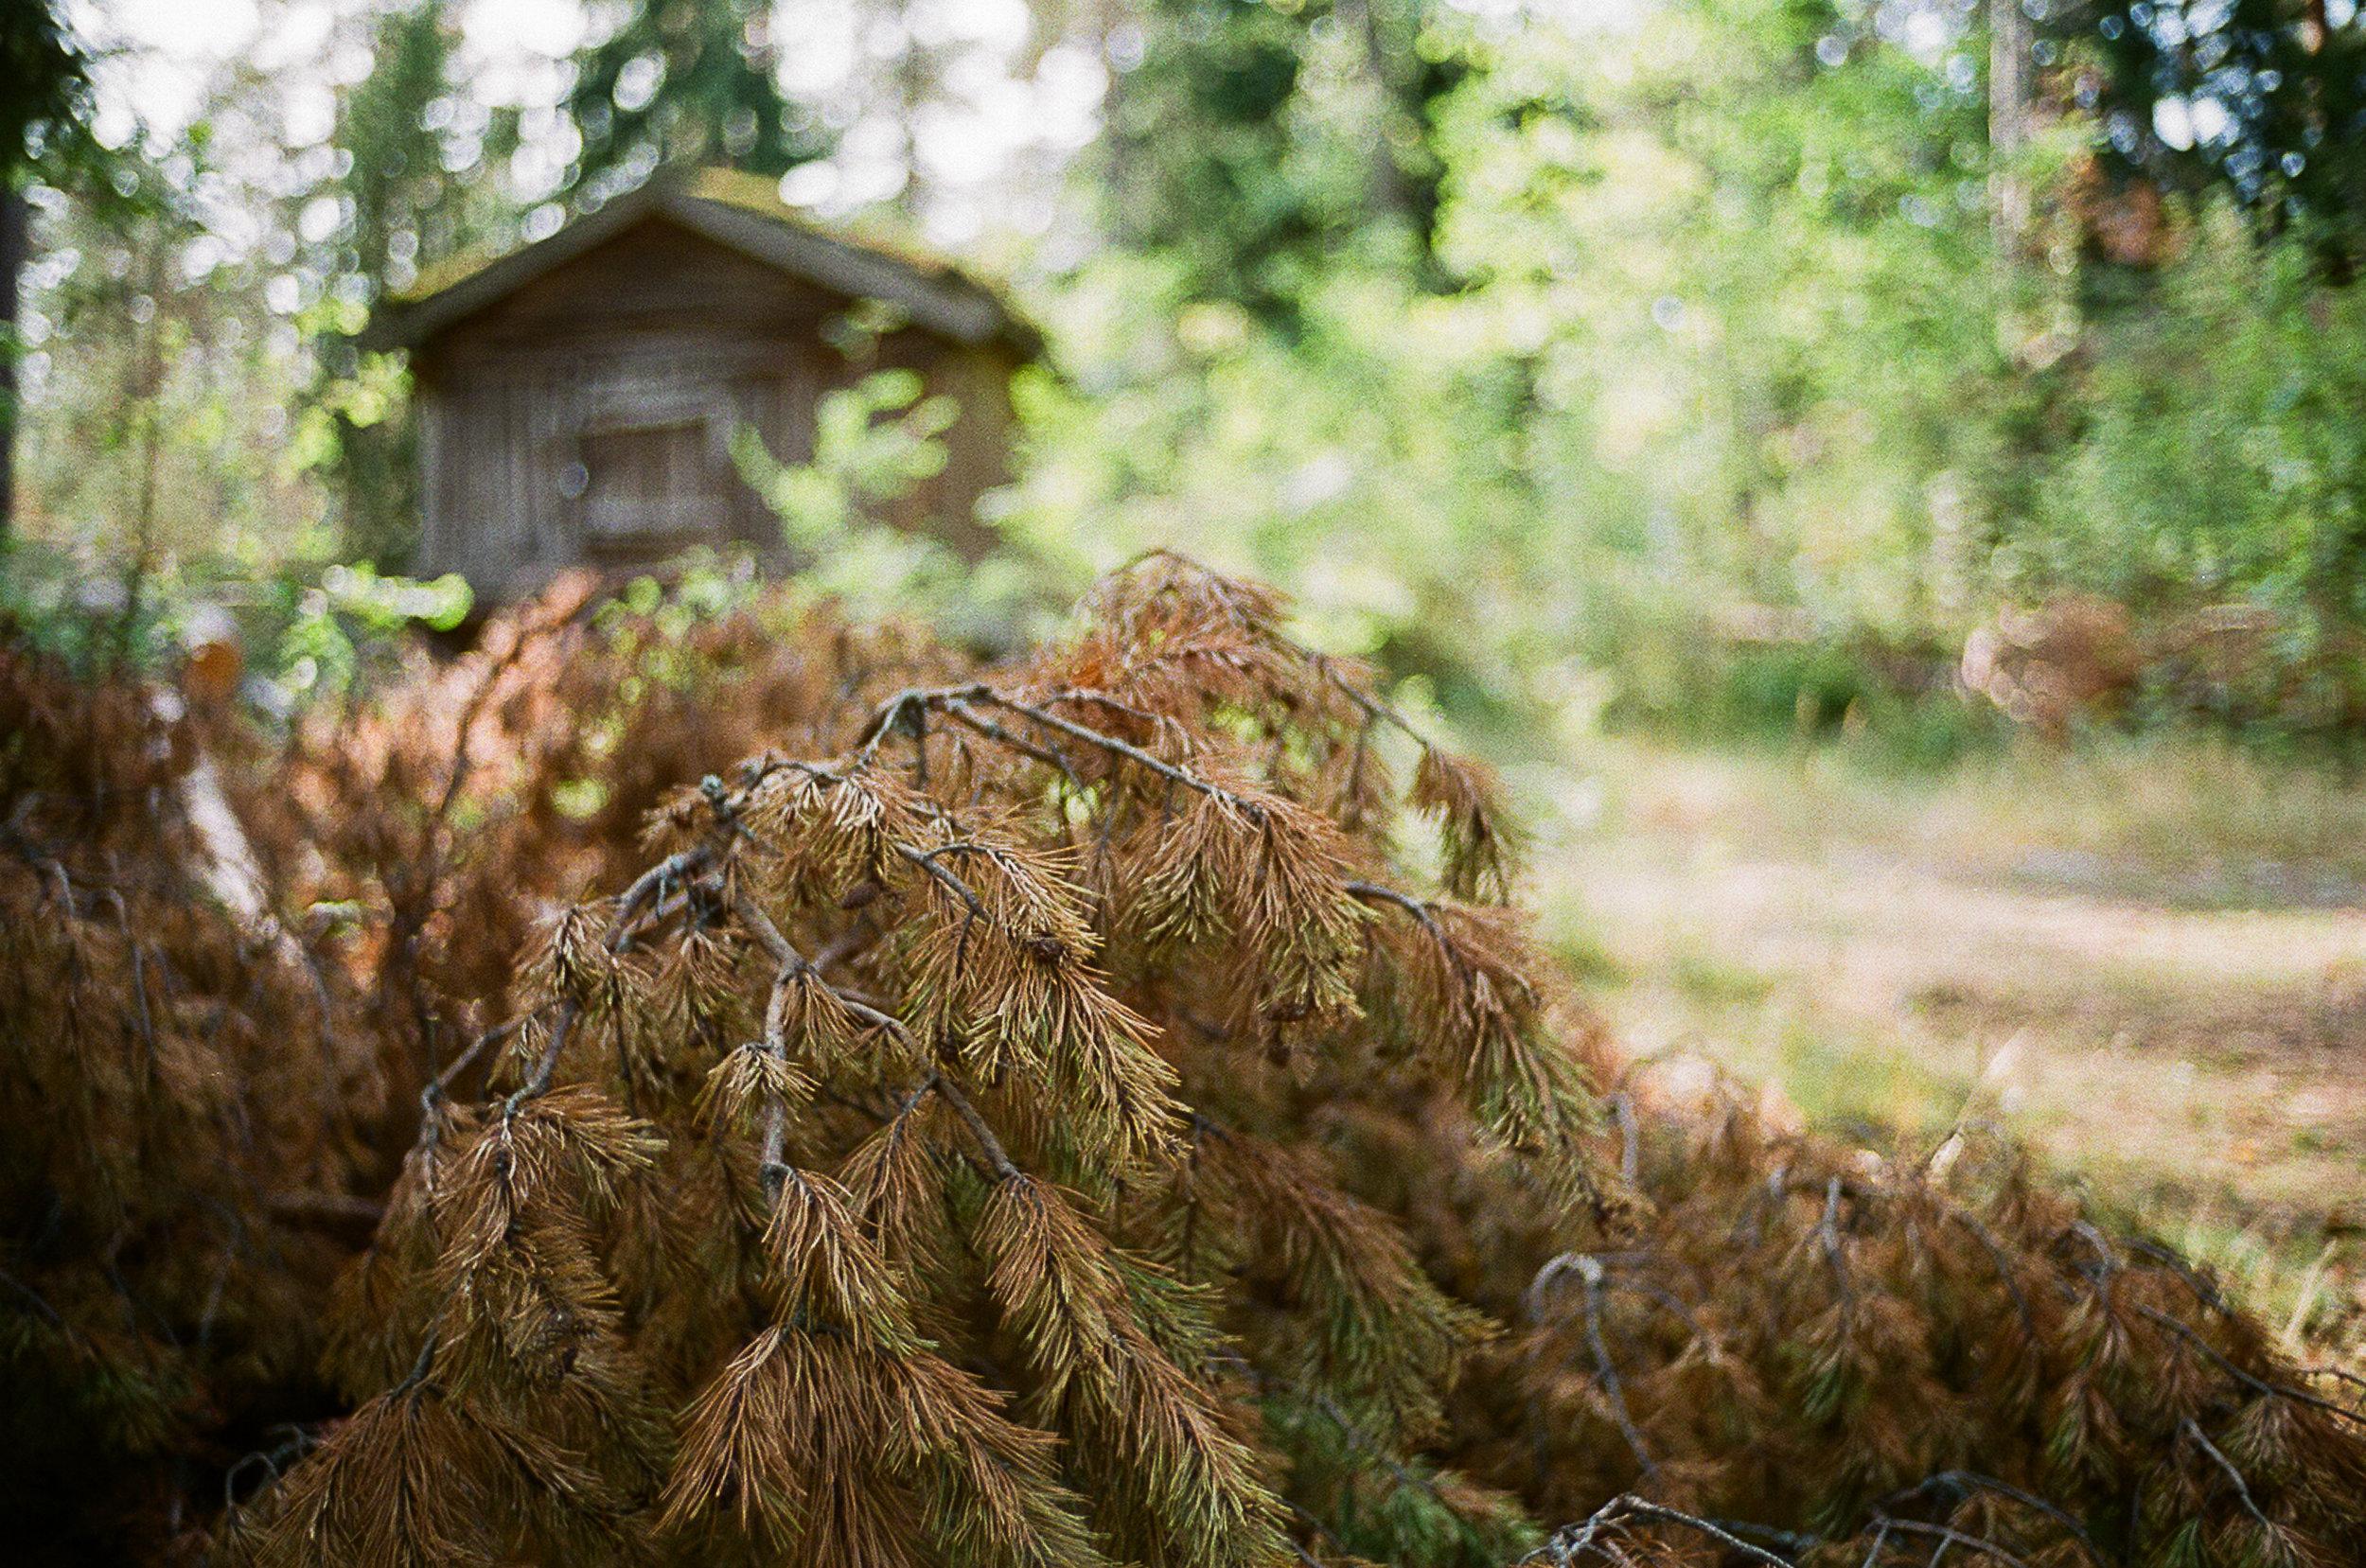 Shot via Voigtlander 35mm F1.4 on my Leica M6